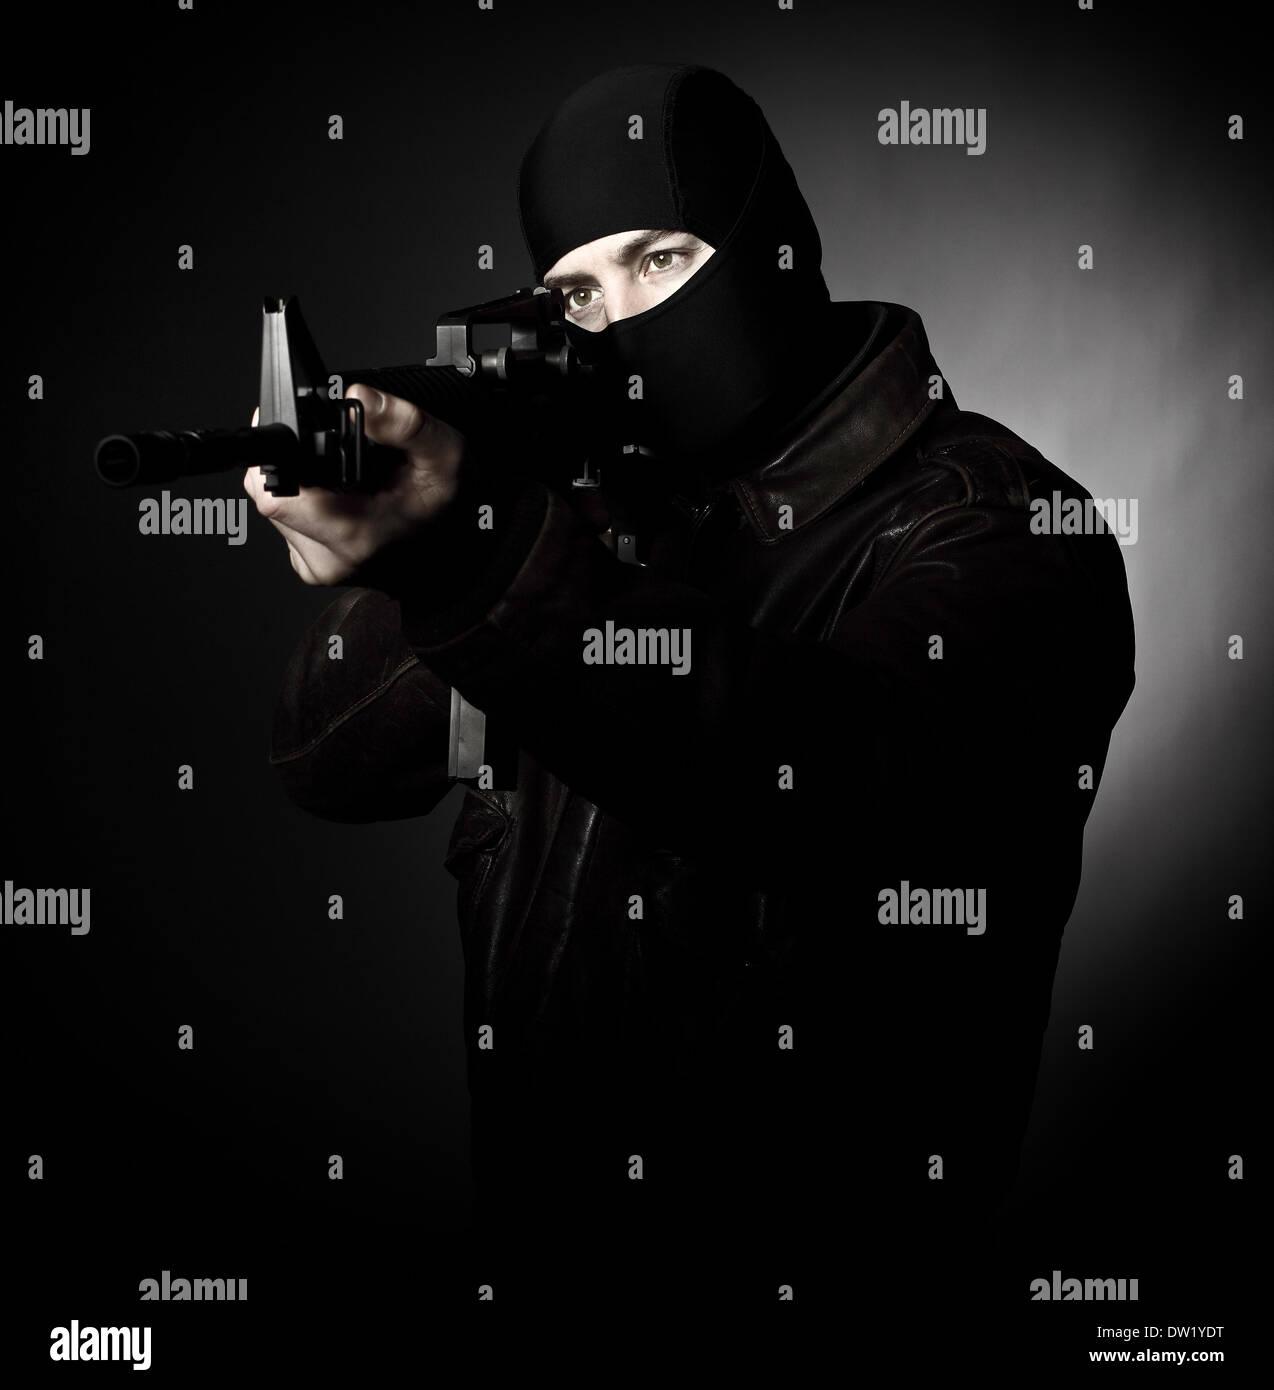 criminal with rifle - Stock Image